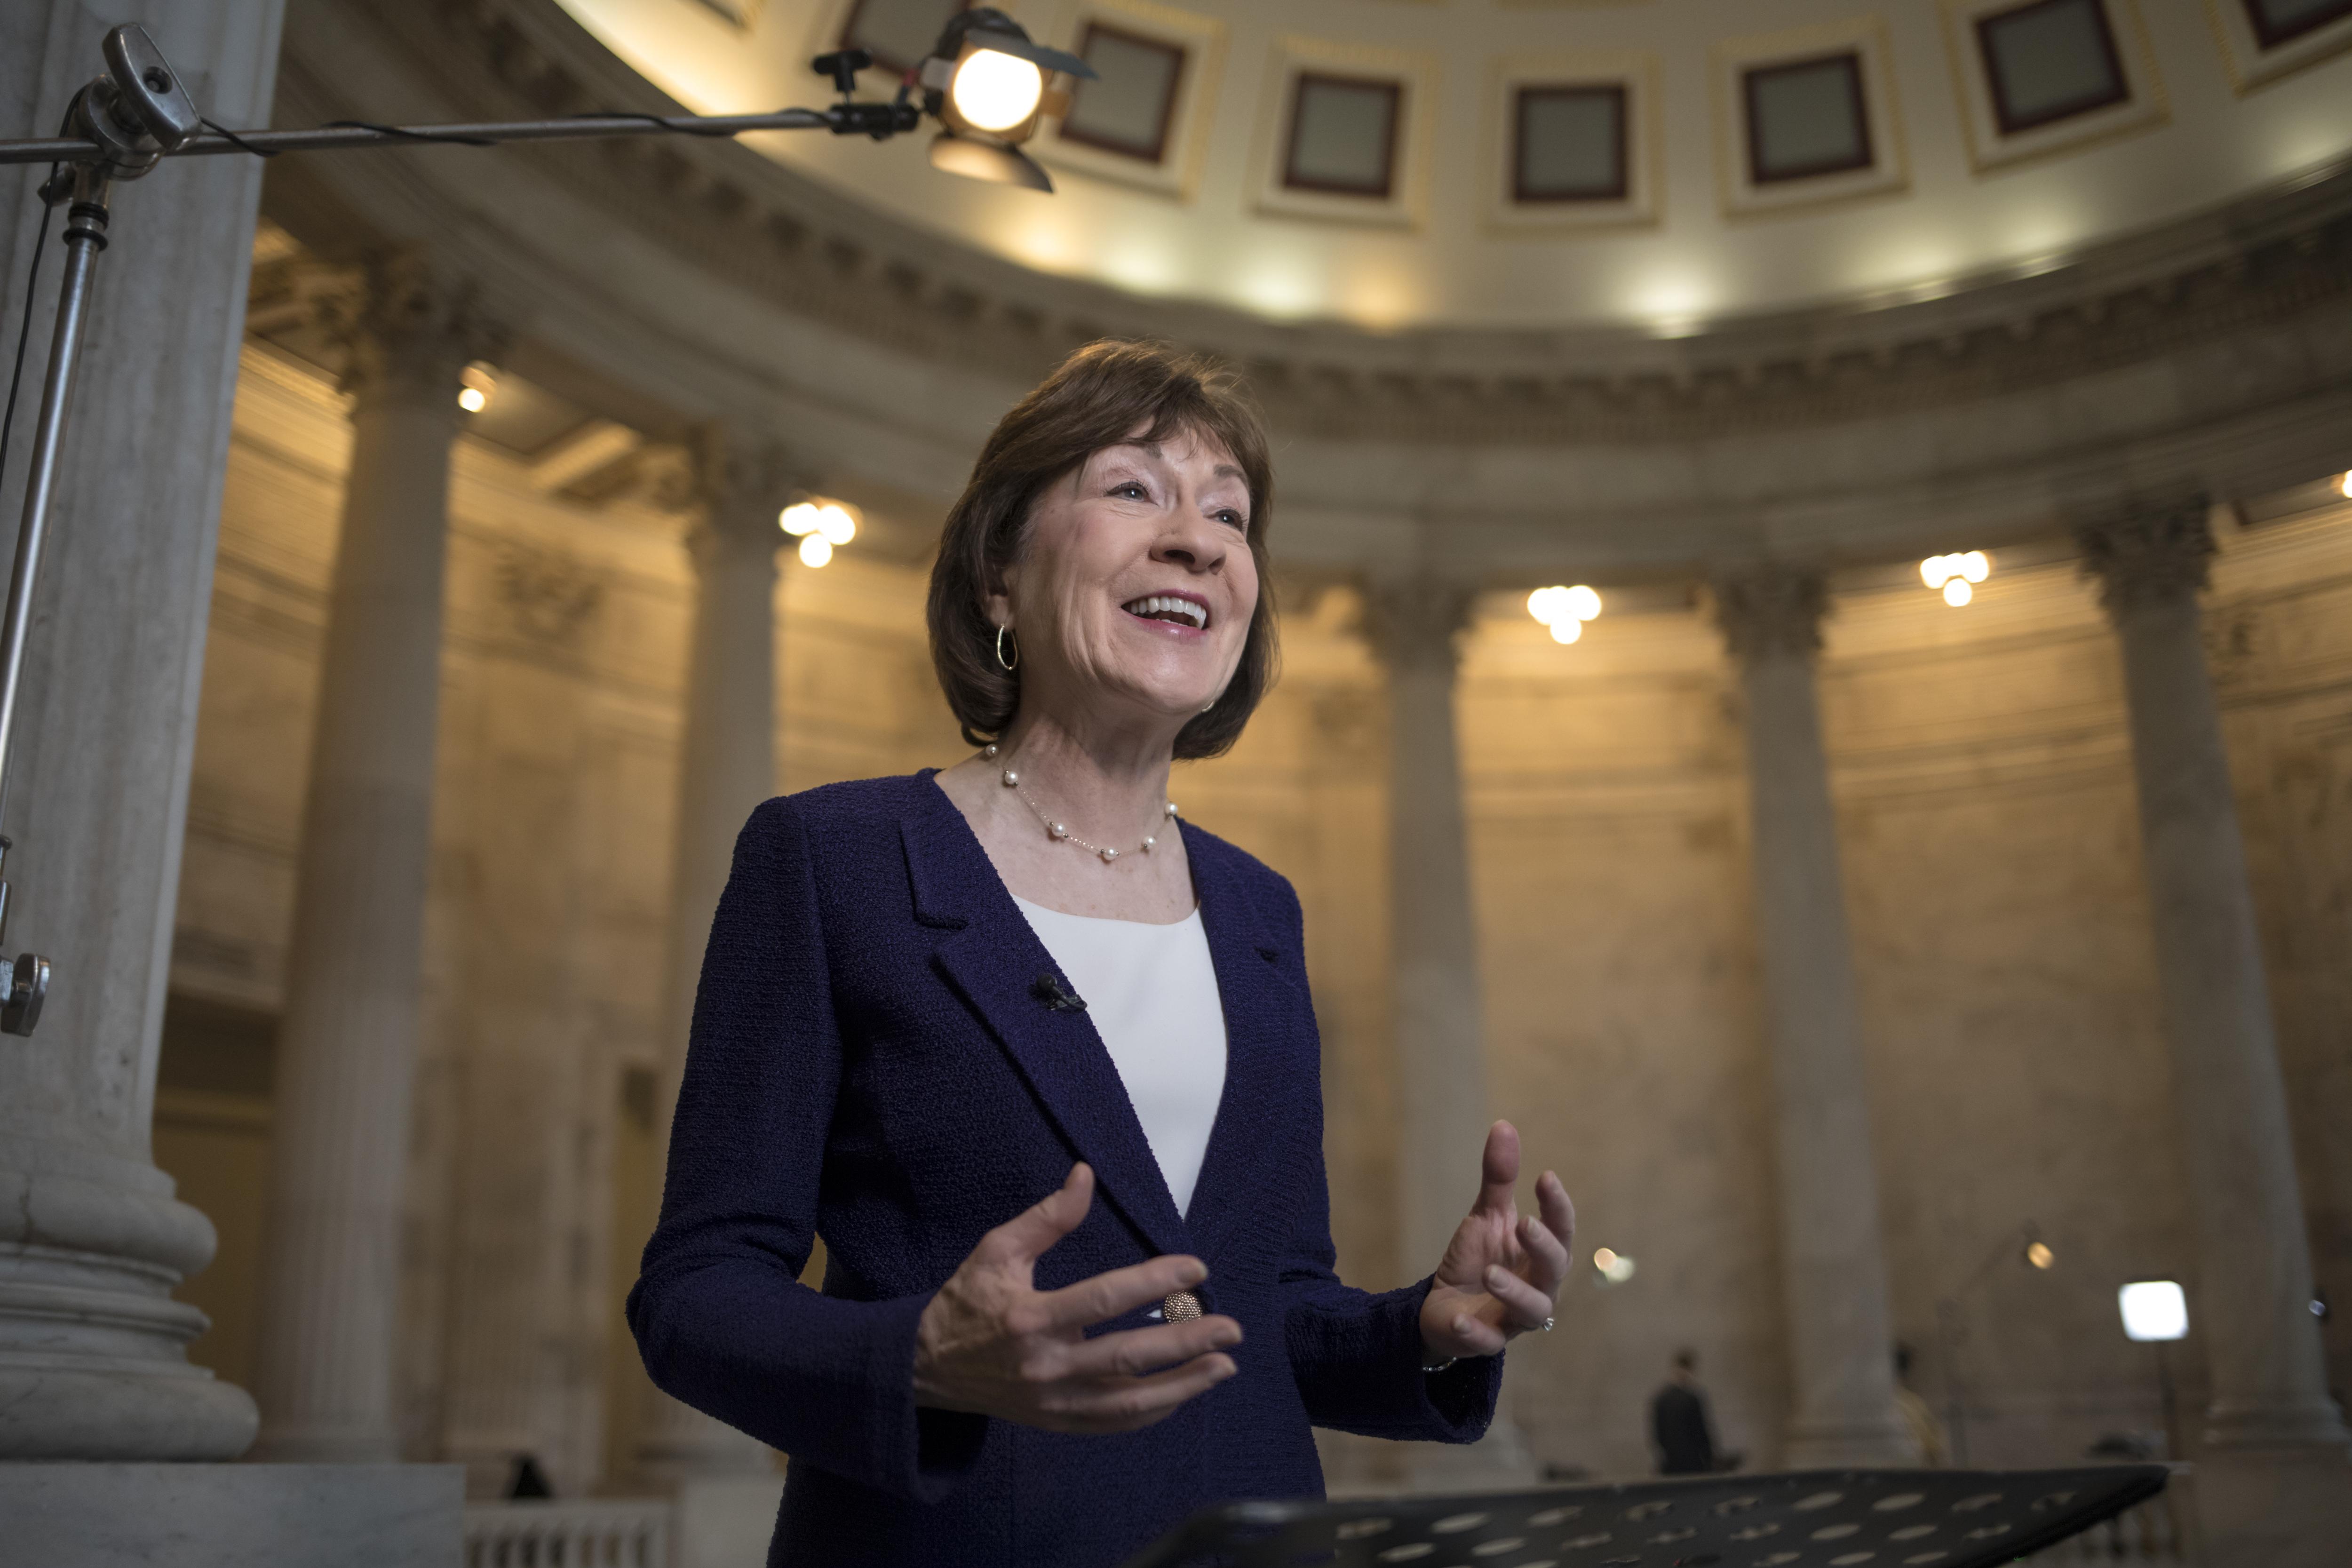 GOP senators call on Trump to show restraint in Russia probe